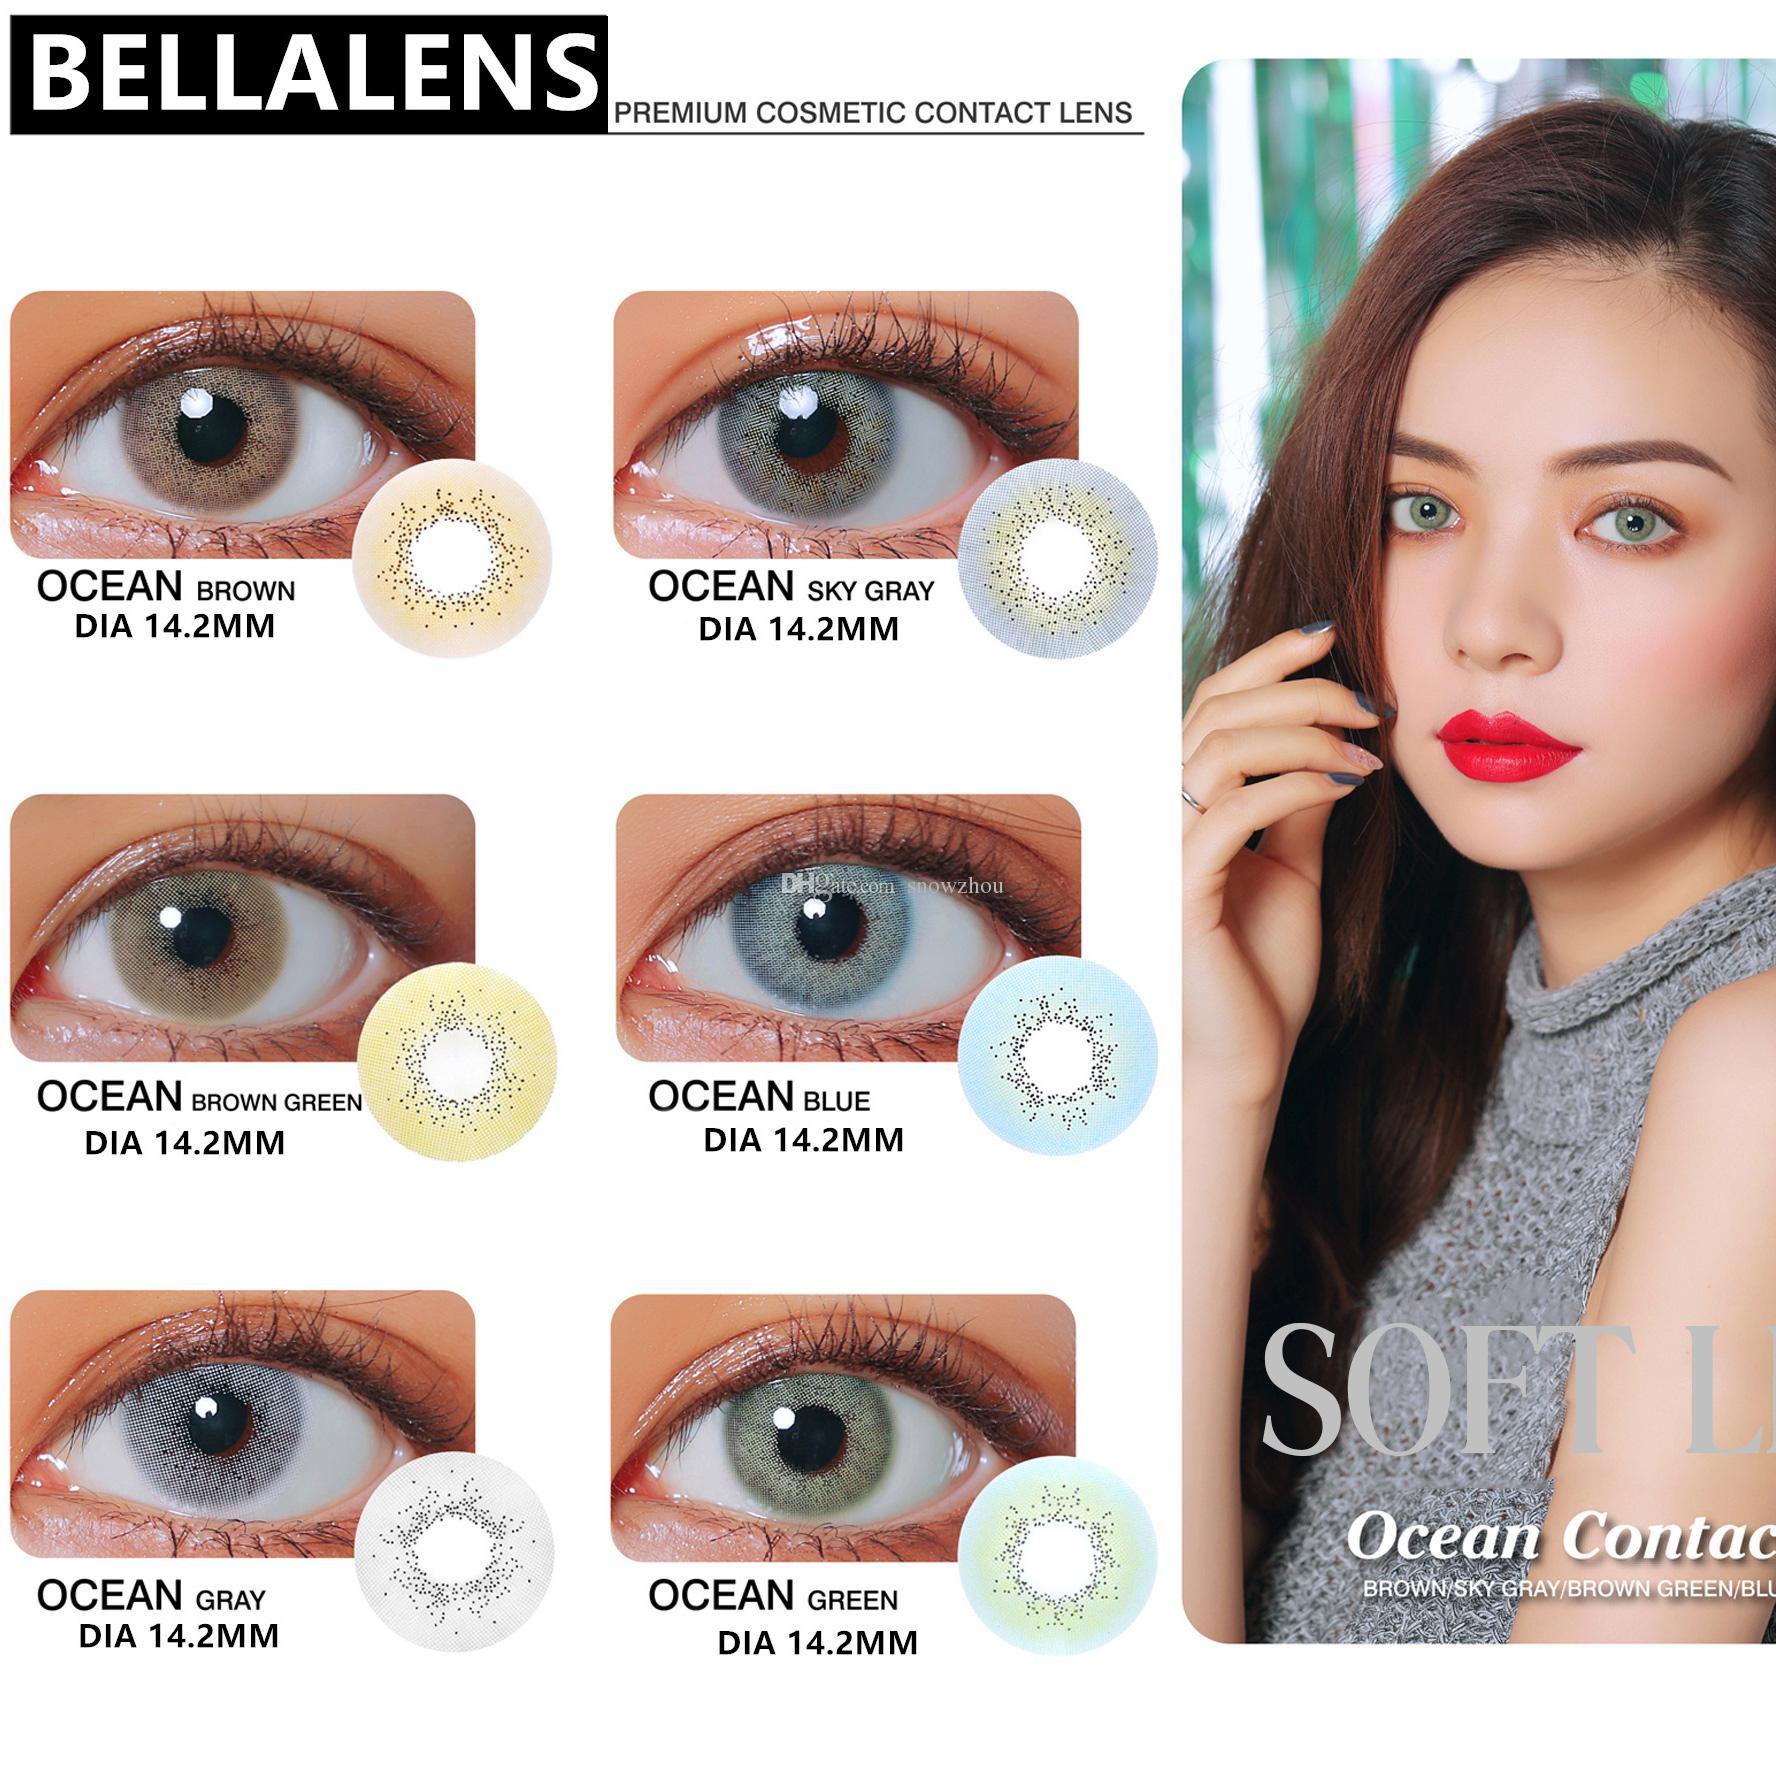 Color contact lenses online shop -  Color Contact Lenses Dhl Shipping Recognized Comsmetic Contact Lenses Color Contact Lenses Online With 5 95 Pair On Snowzhou S Store Dhgate Com